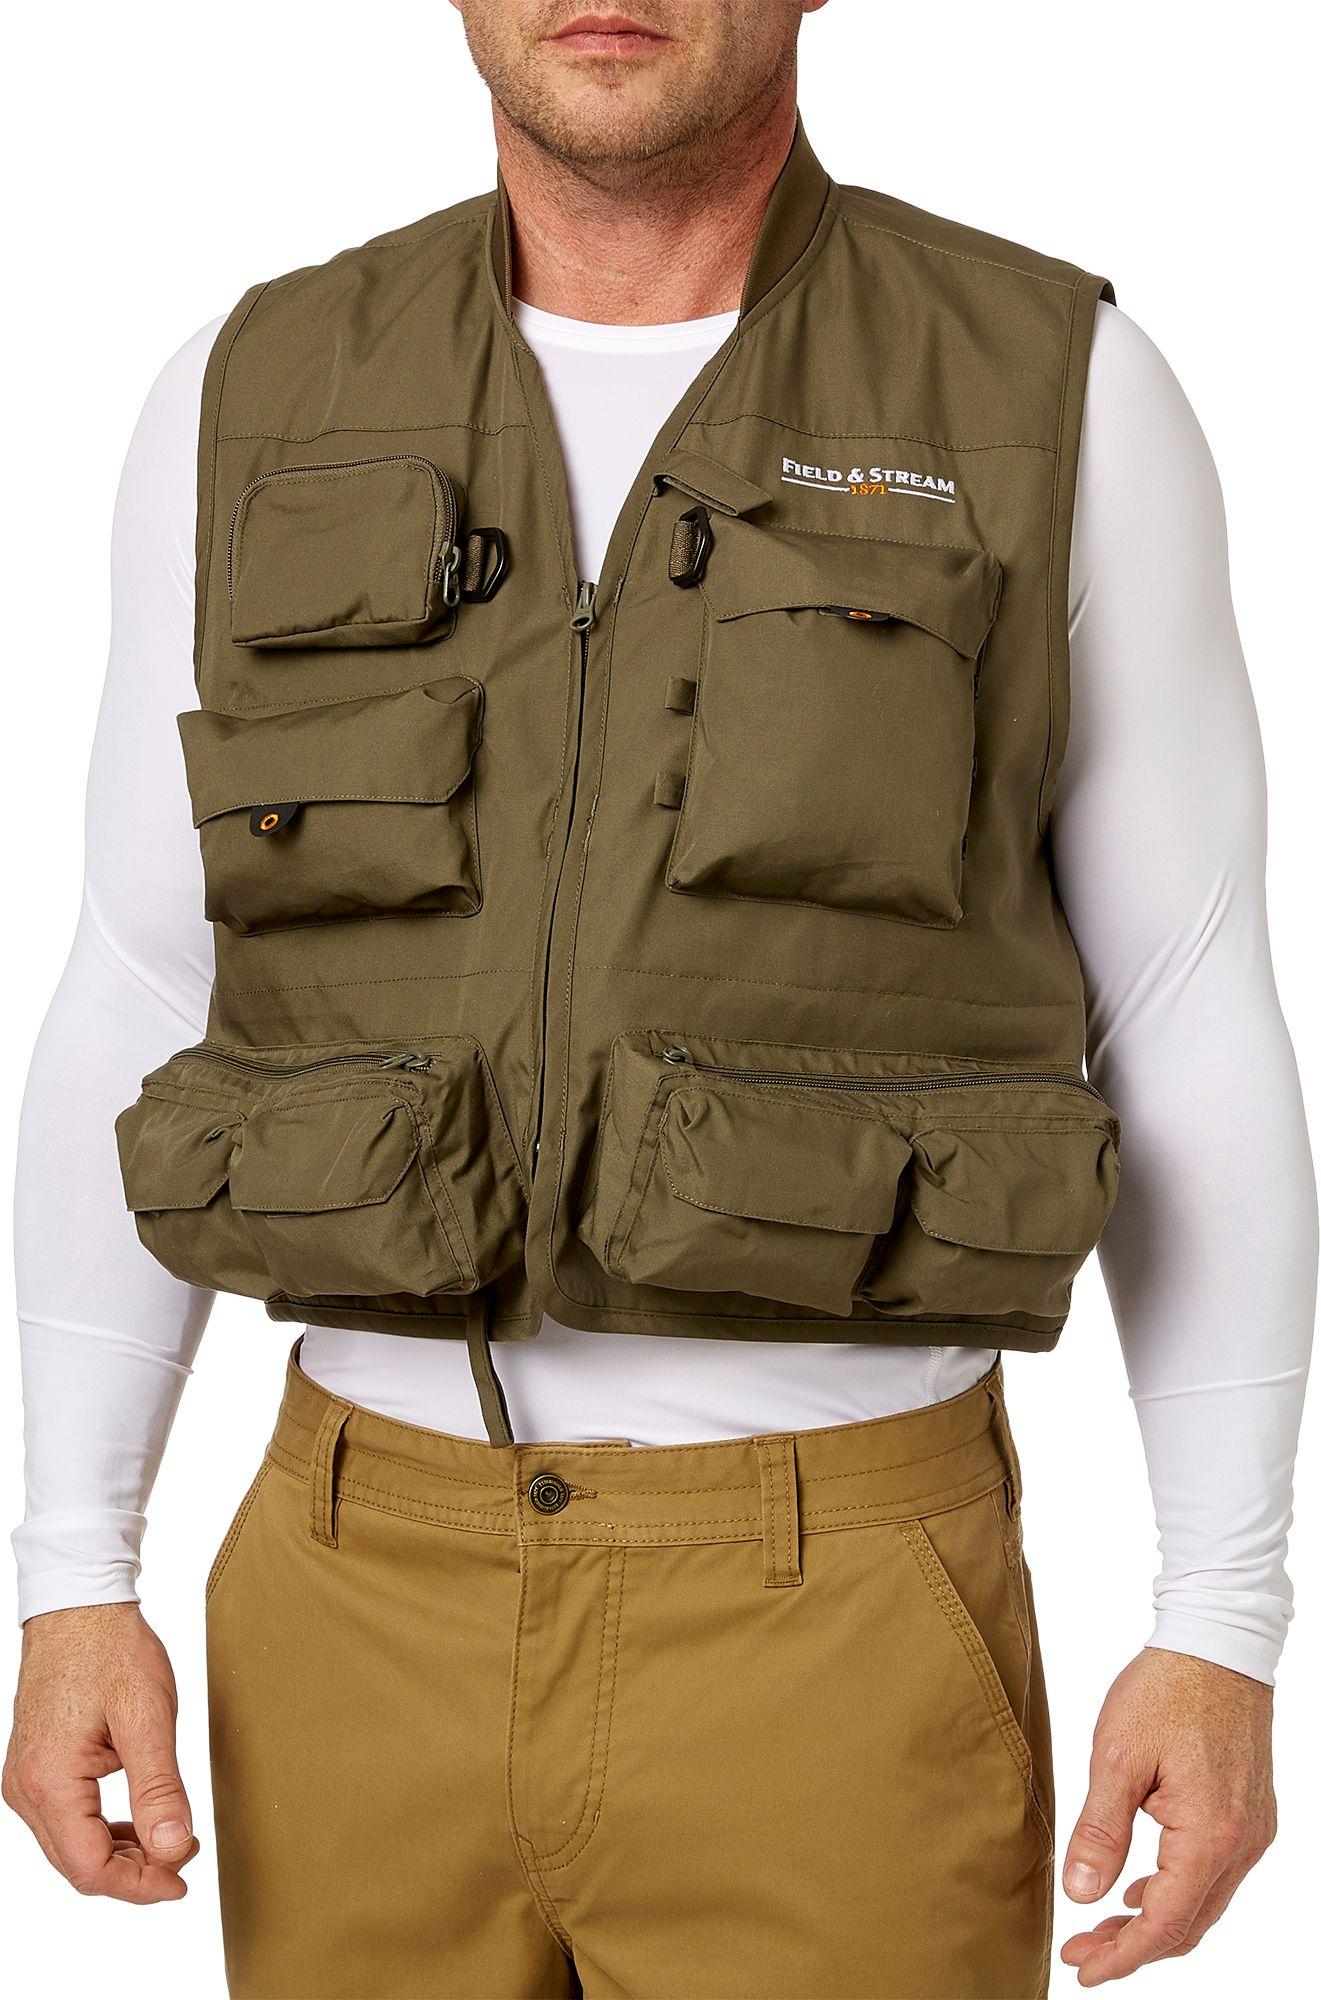 Field & Stream Men's Multi Pocket Fishing Vest   DICK'S Sporting Goods